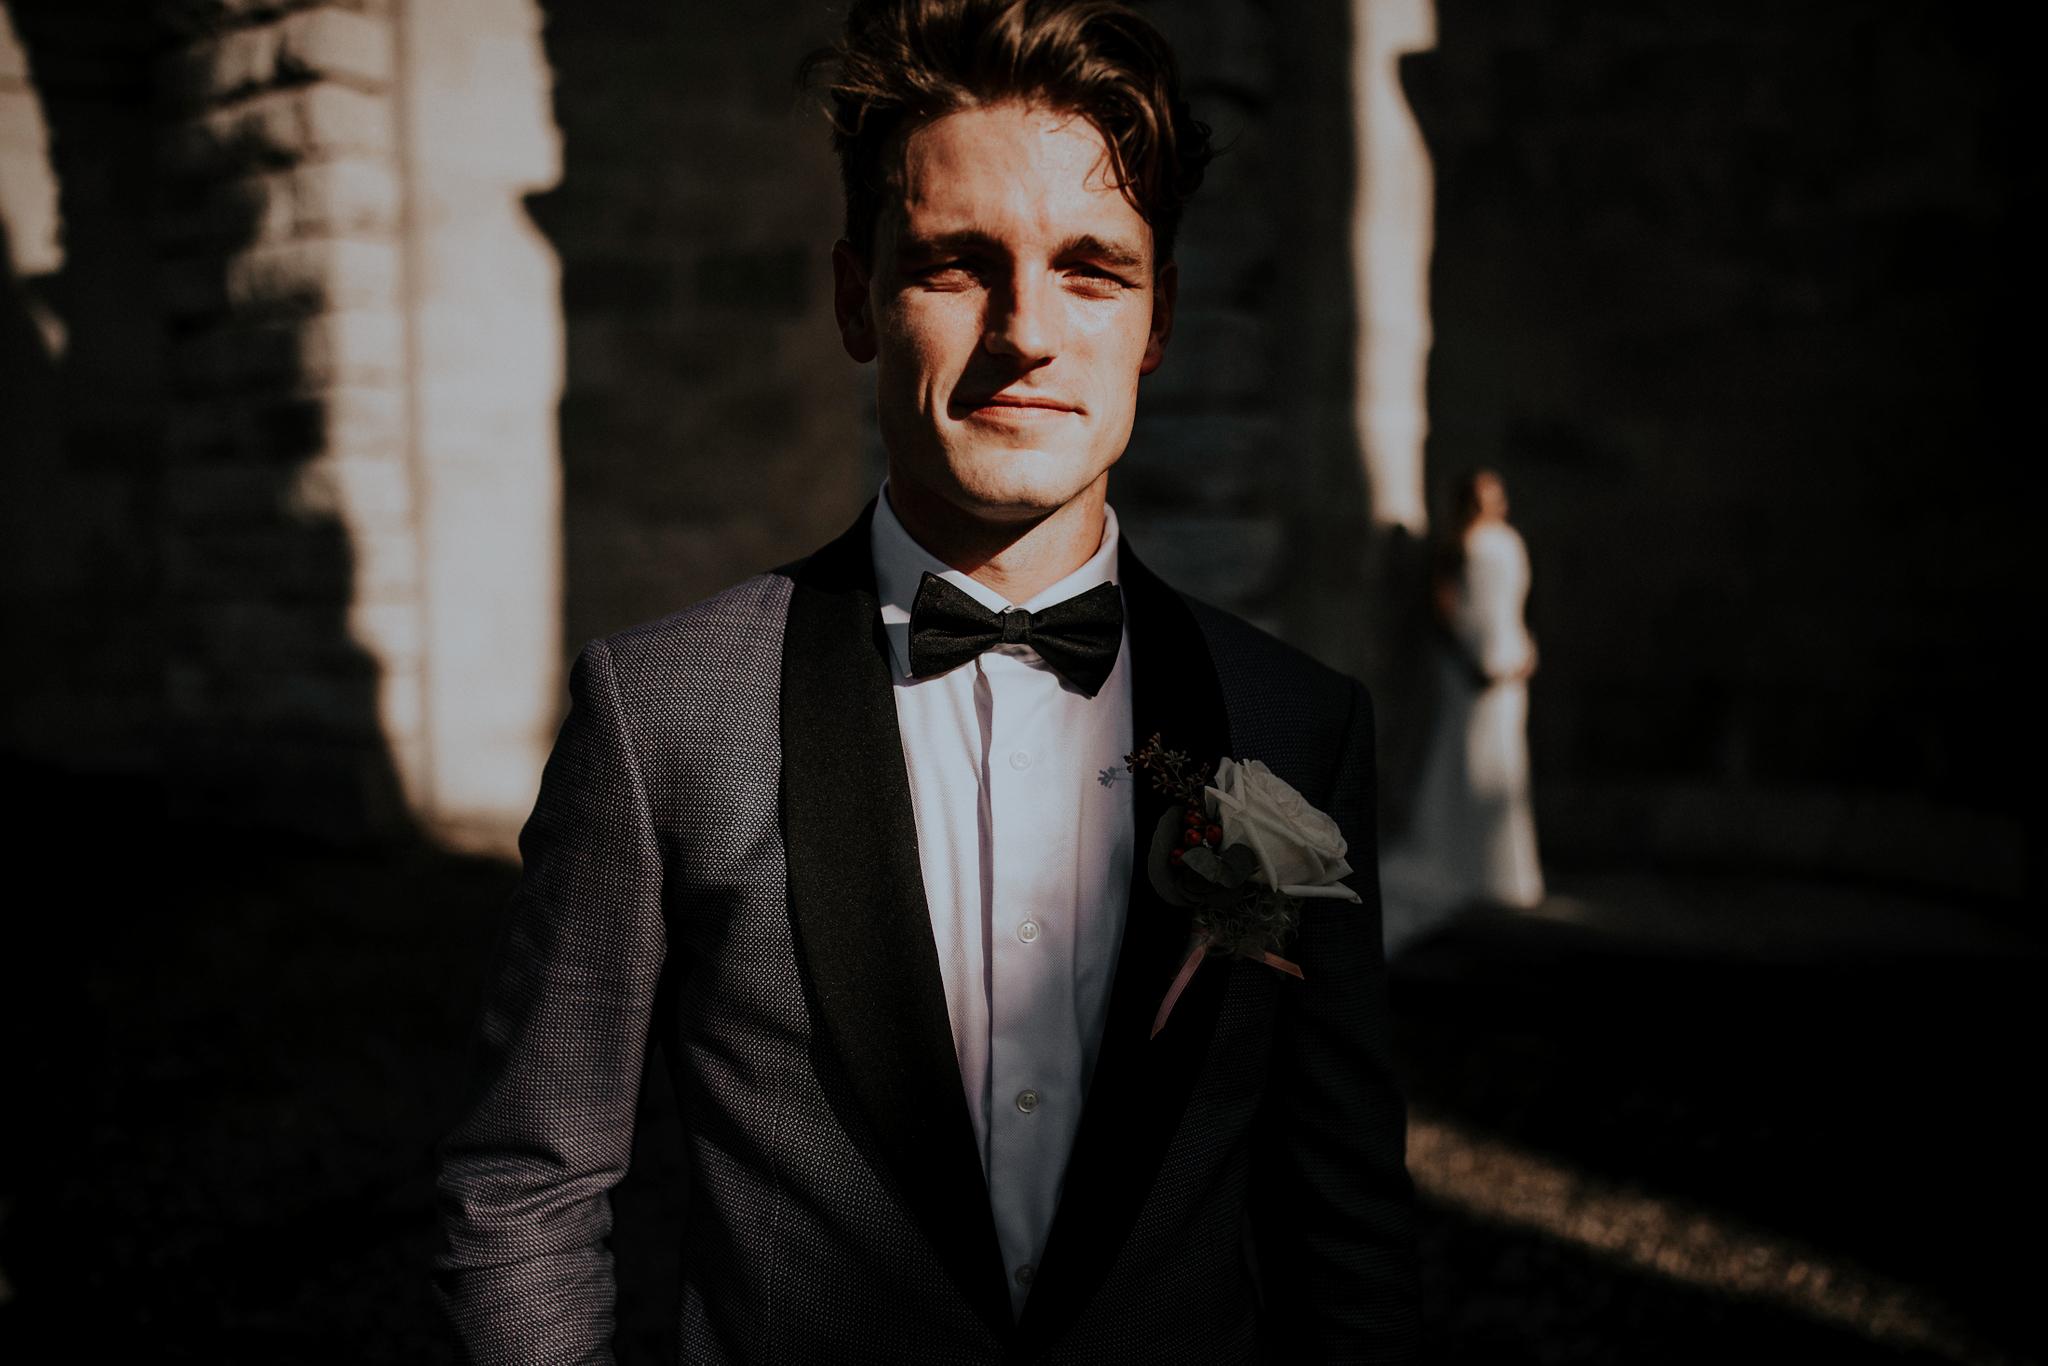 destination-austin-wedding-photographer-italy-florence488.JPG